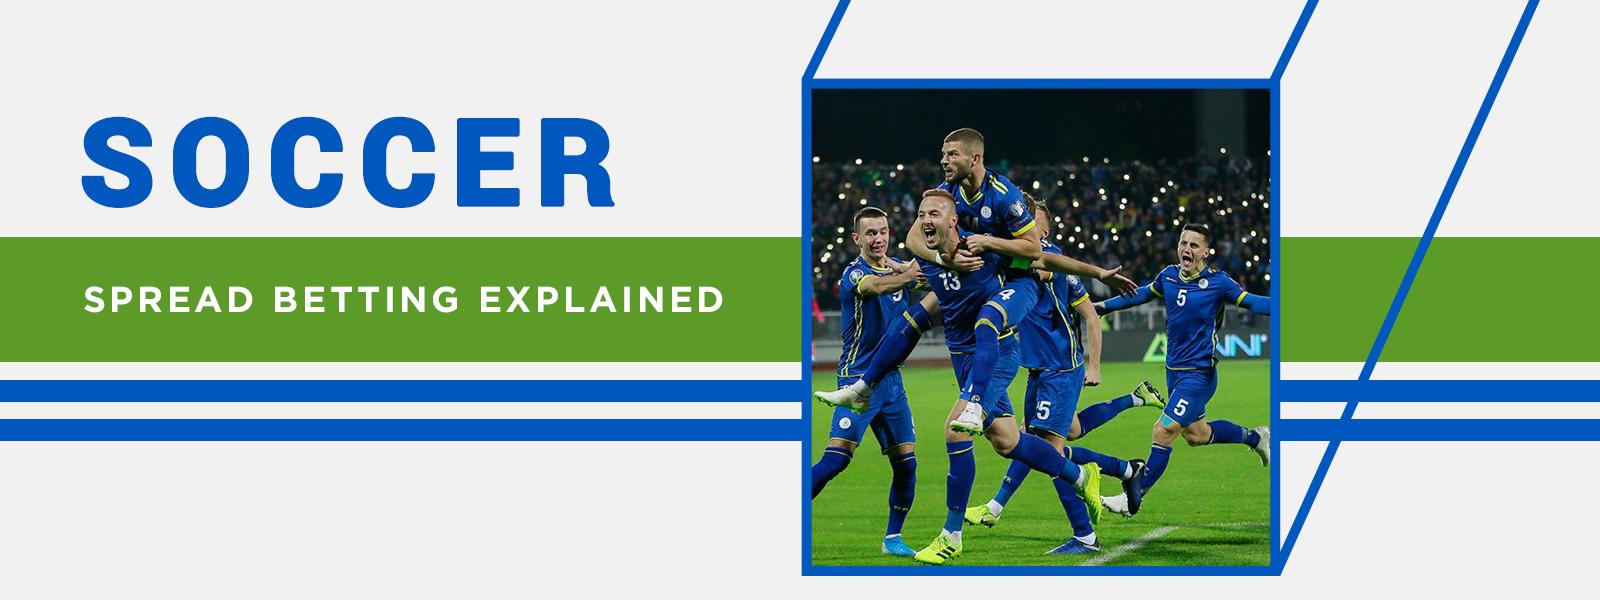 SoccerTipsters Blog | Soccer Spread Betting Explained